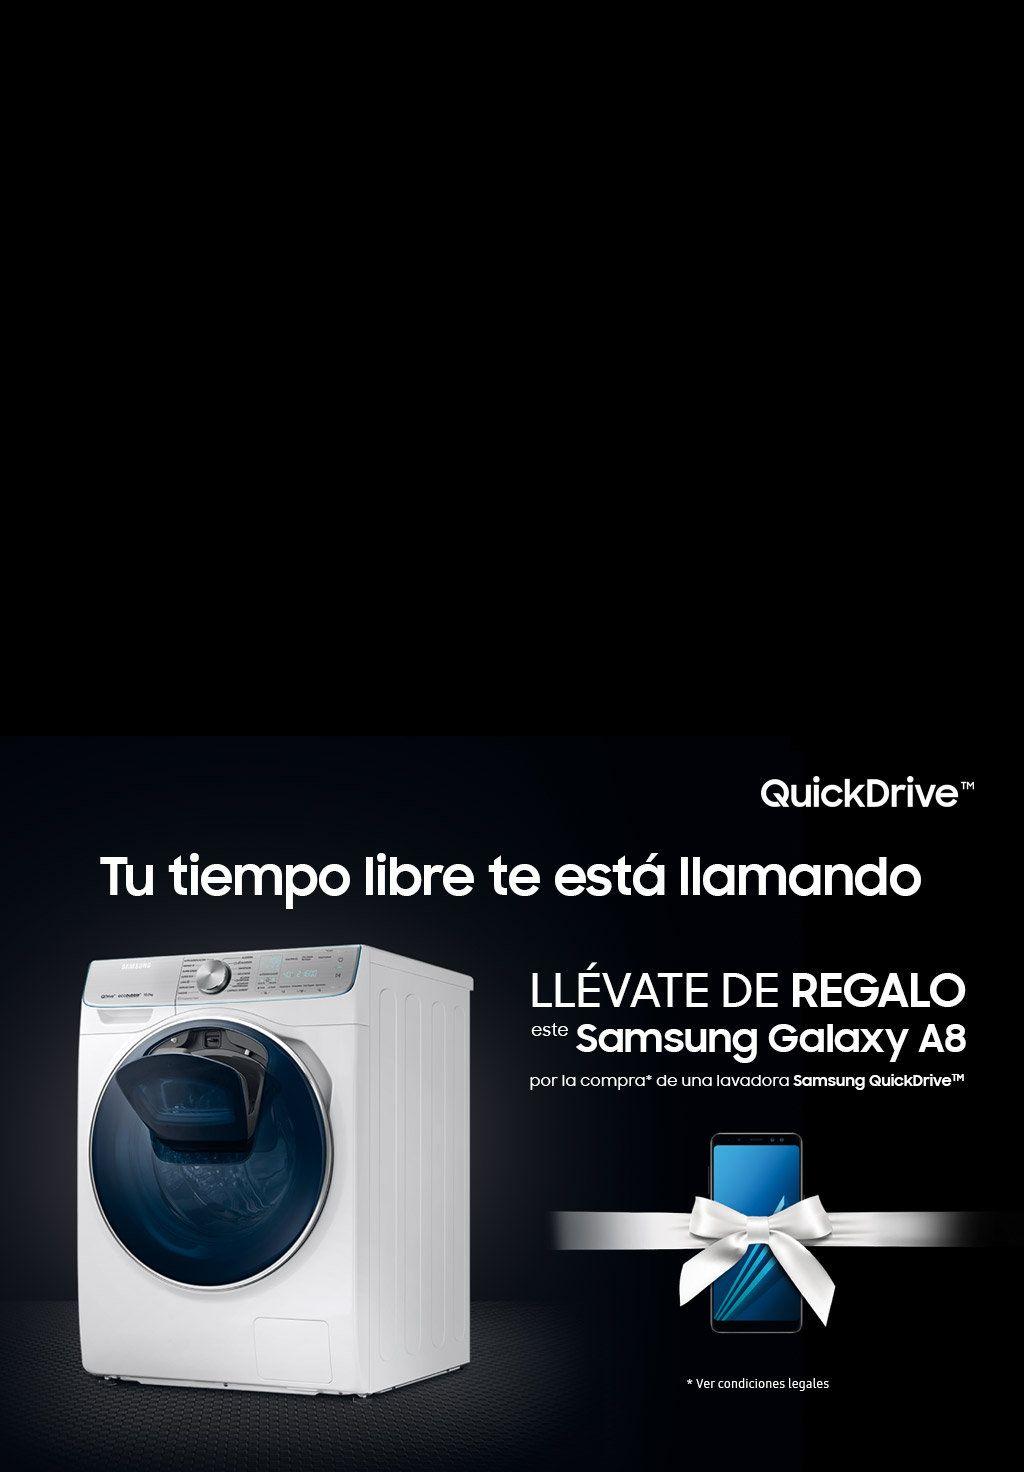 Samsung A8 GRATIS (370€) al comprar Lavadora QuickDrive (677€)